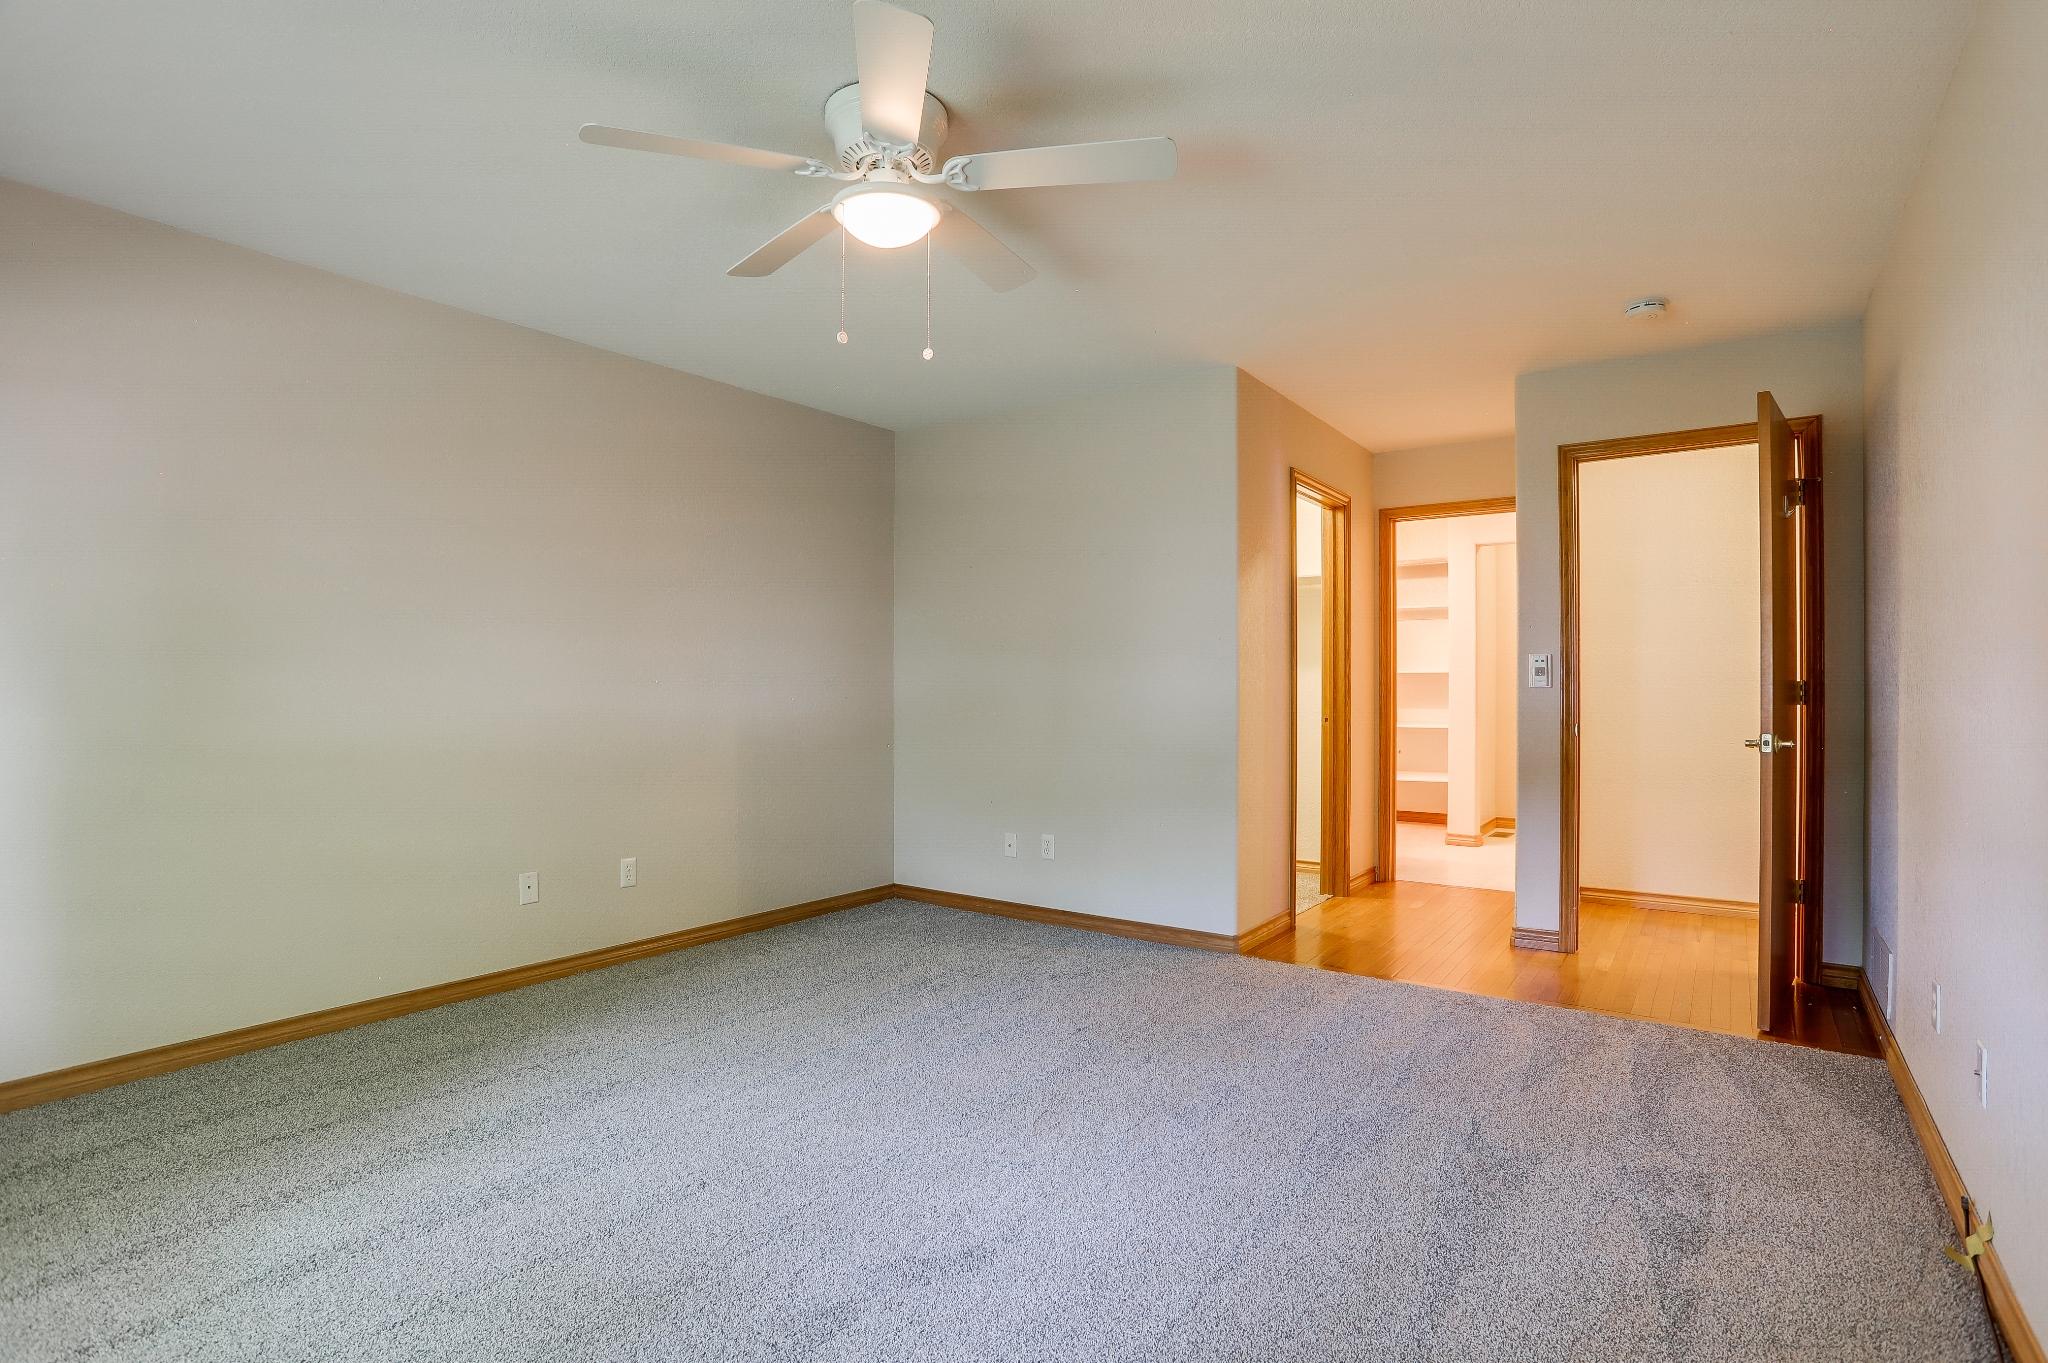 REAL ESTATE LISTING: 1730 Grove Ct Longmont Master Bedroom